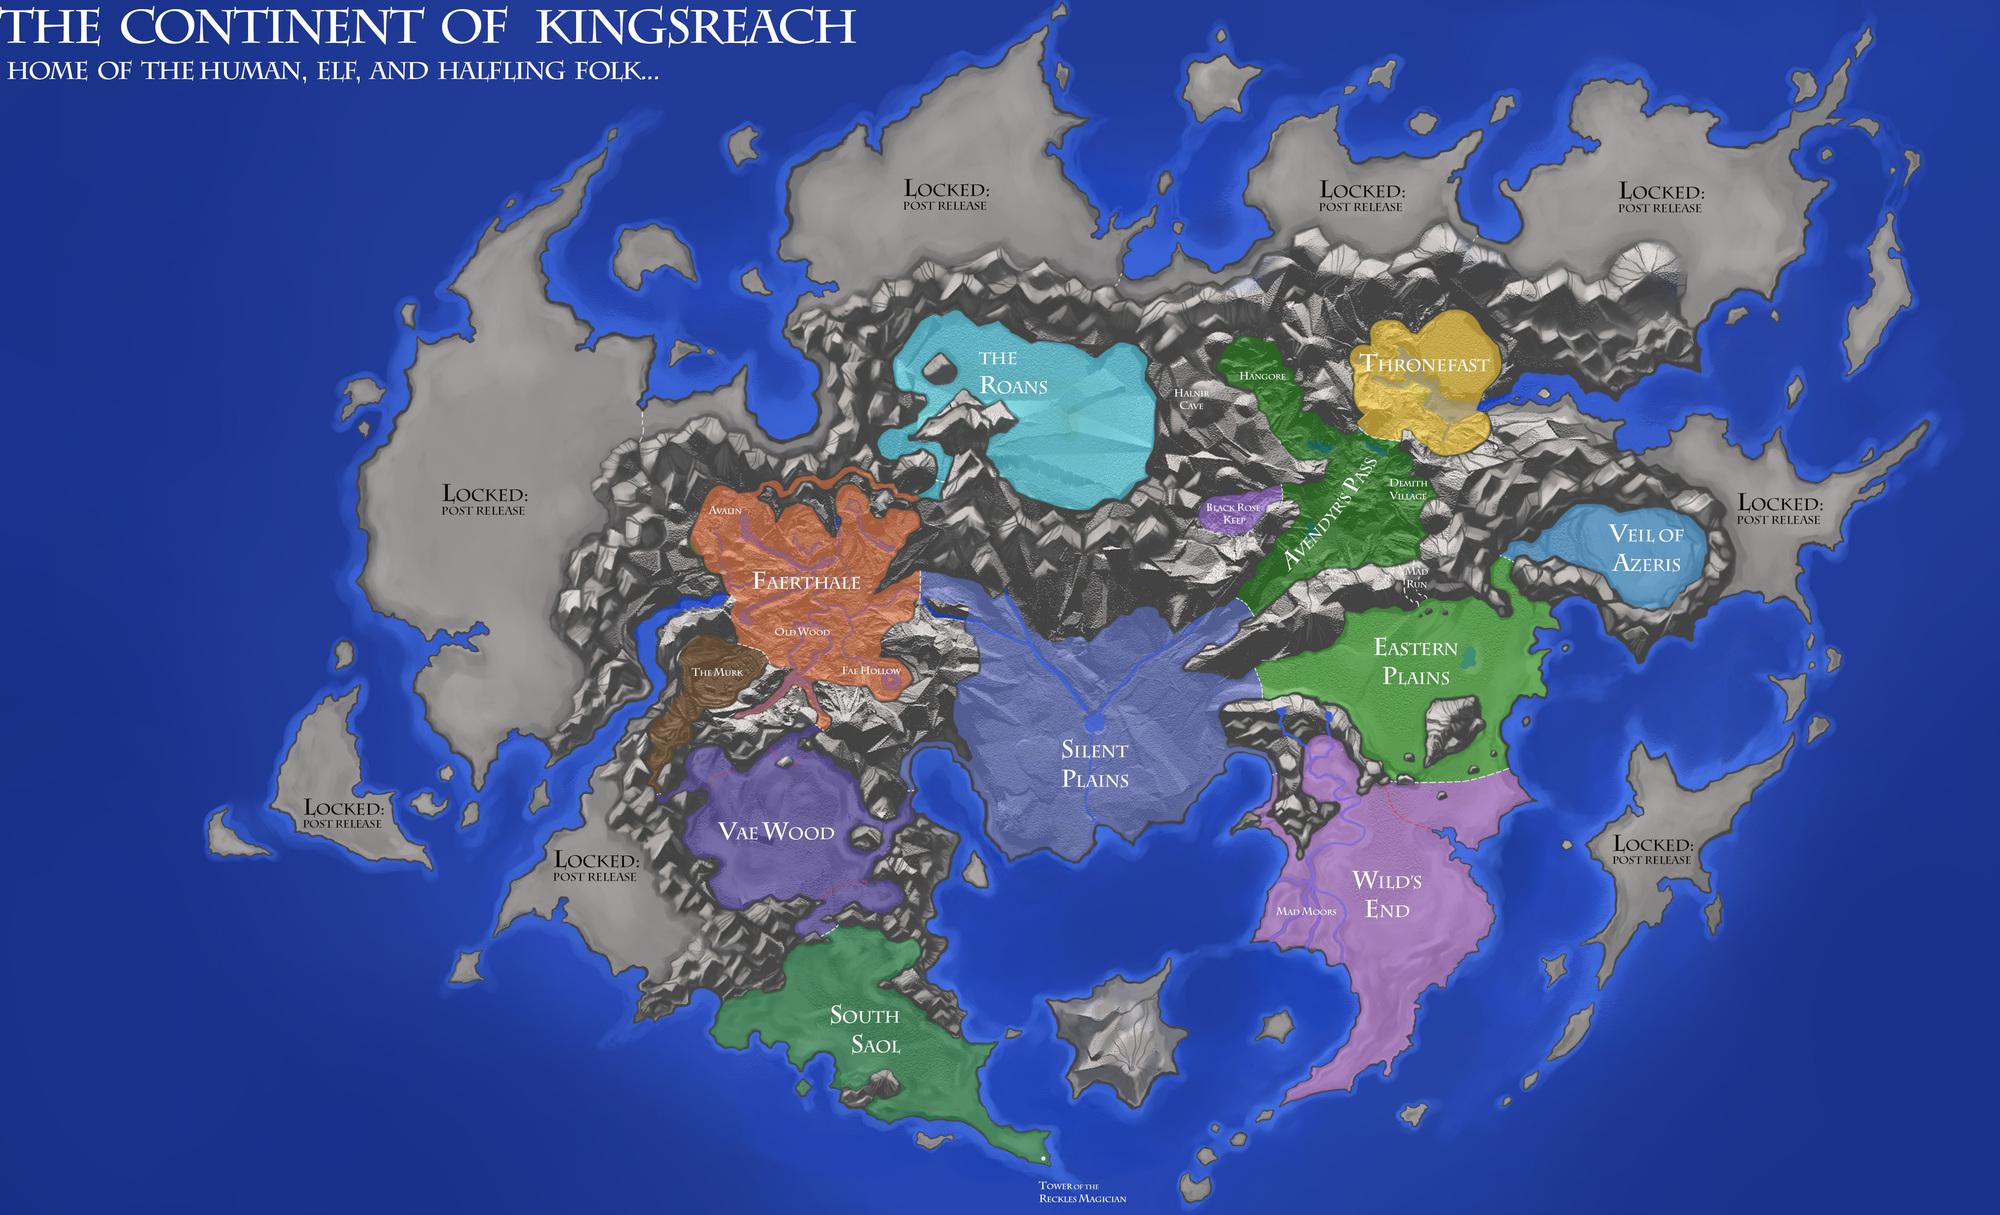 112-20210513-map-jpg